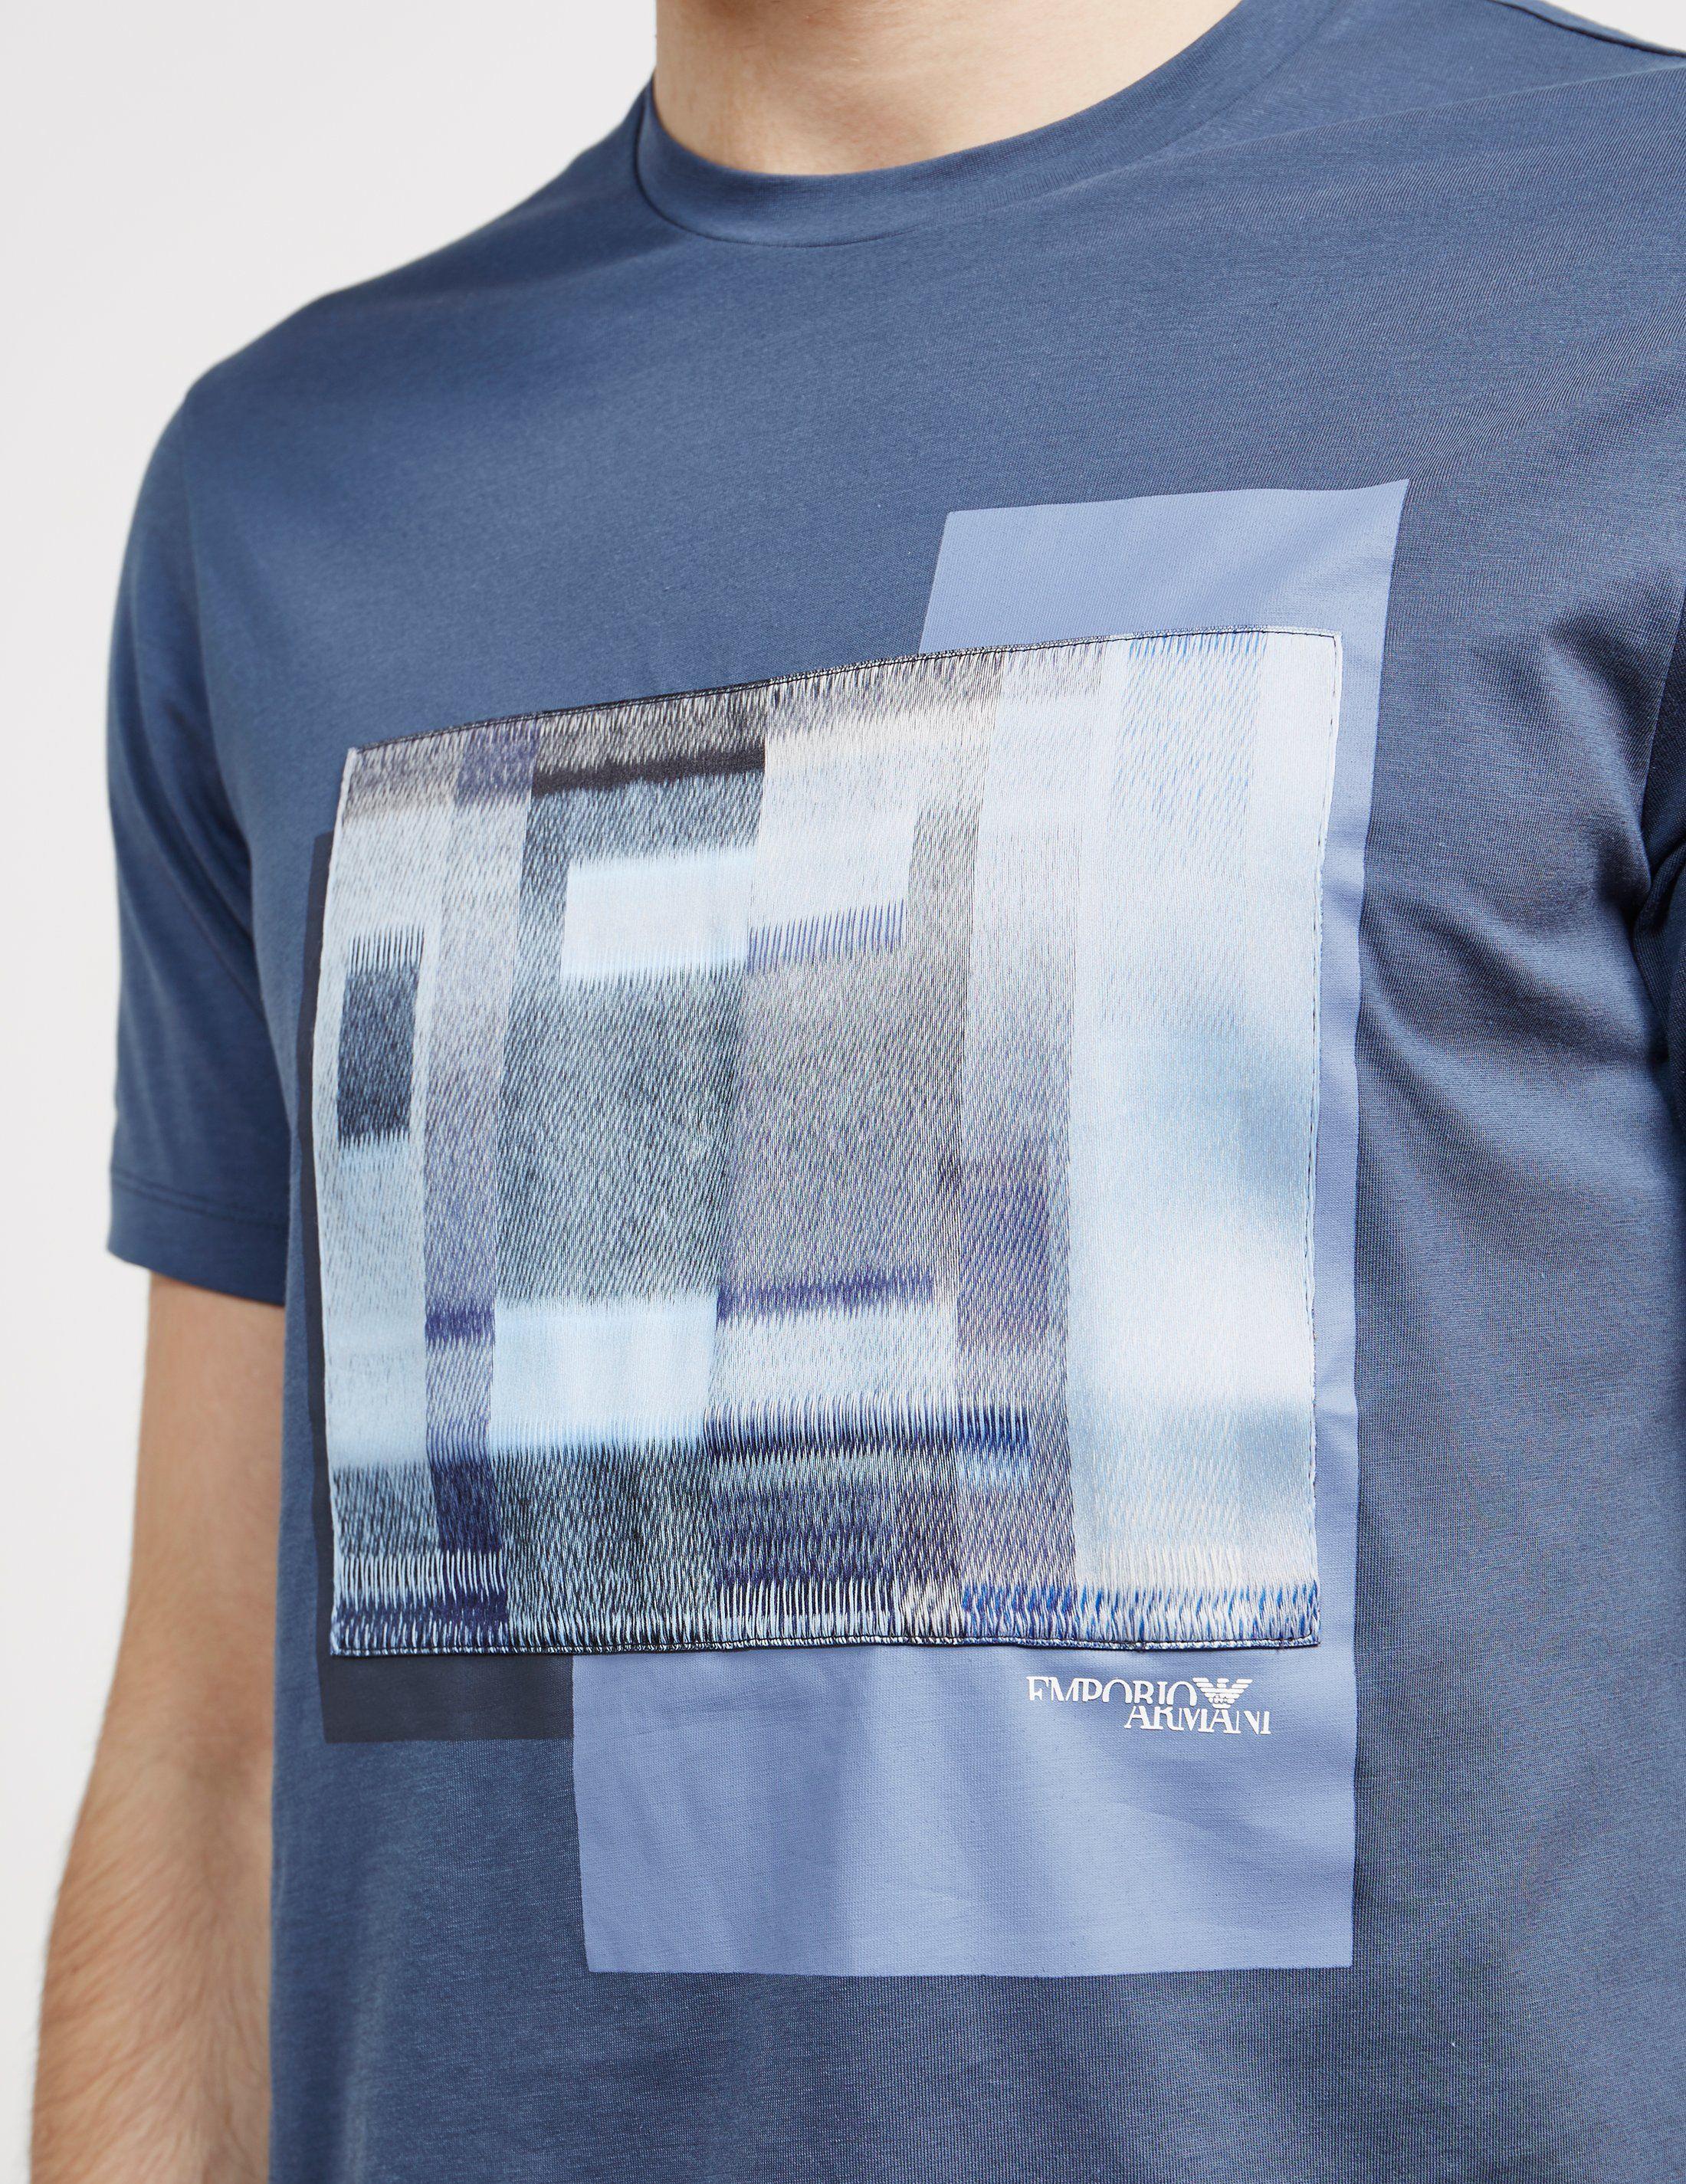 Emporio Armani Graphic Short Sleeve T-Shirt